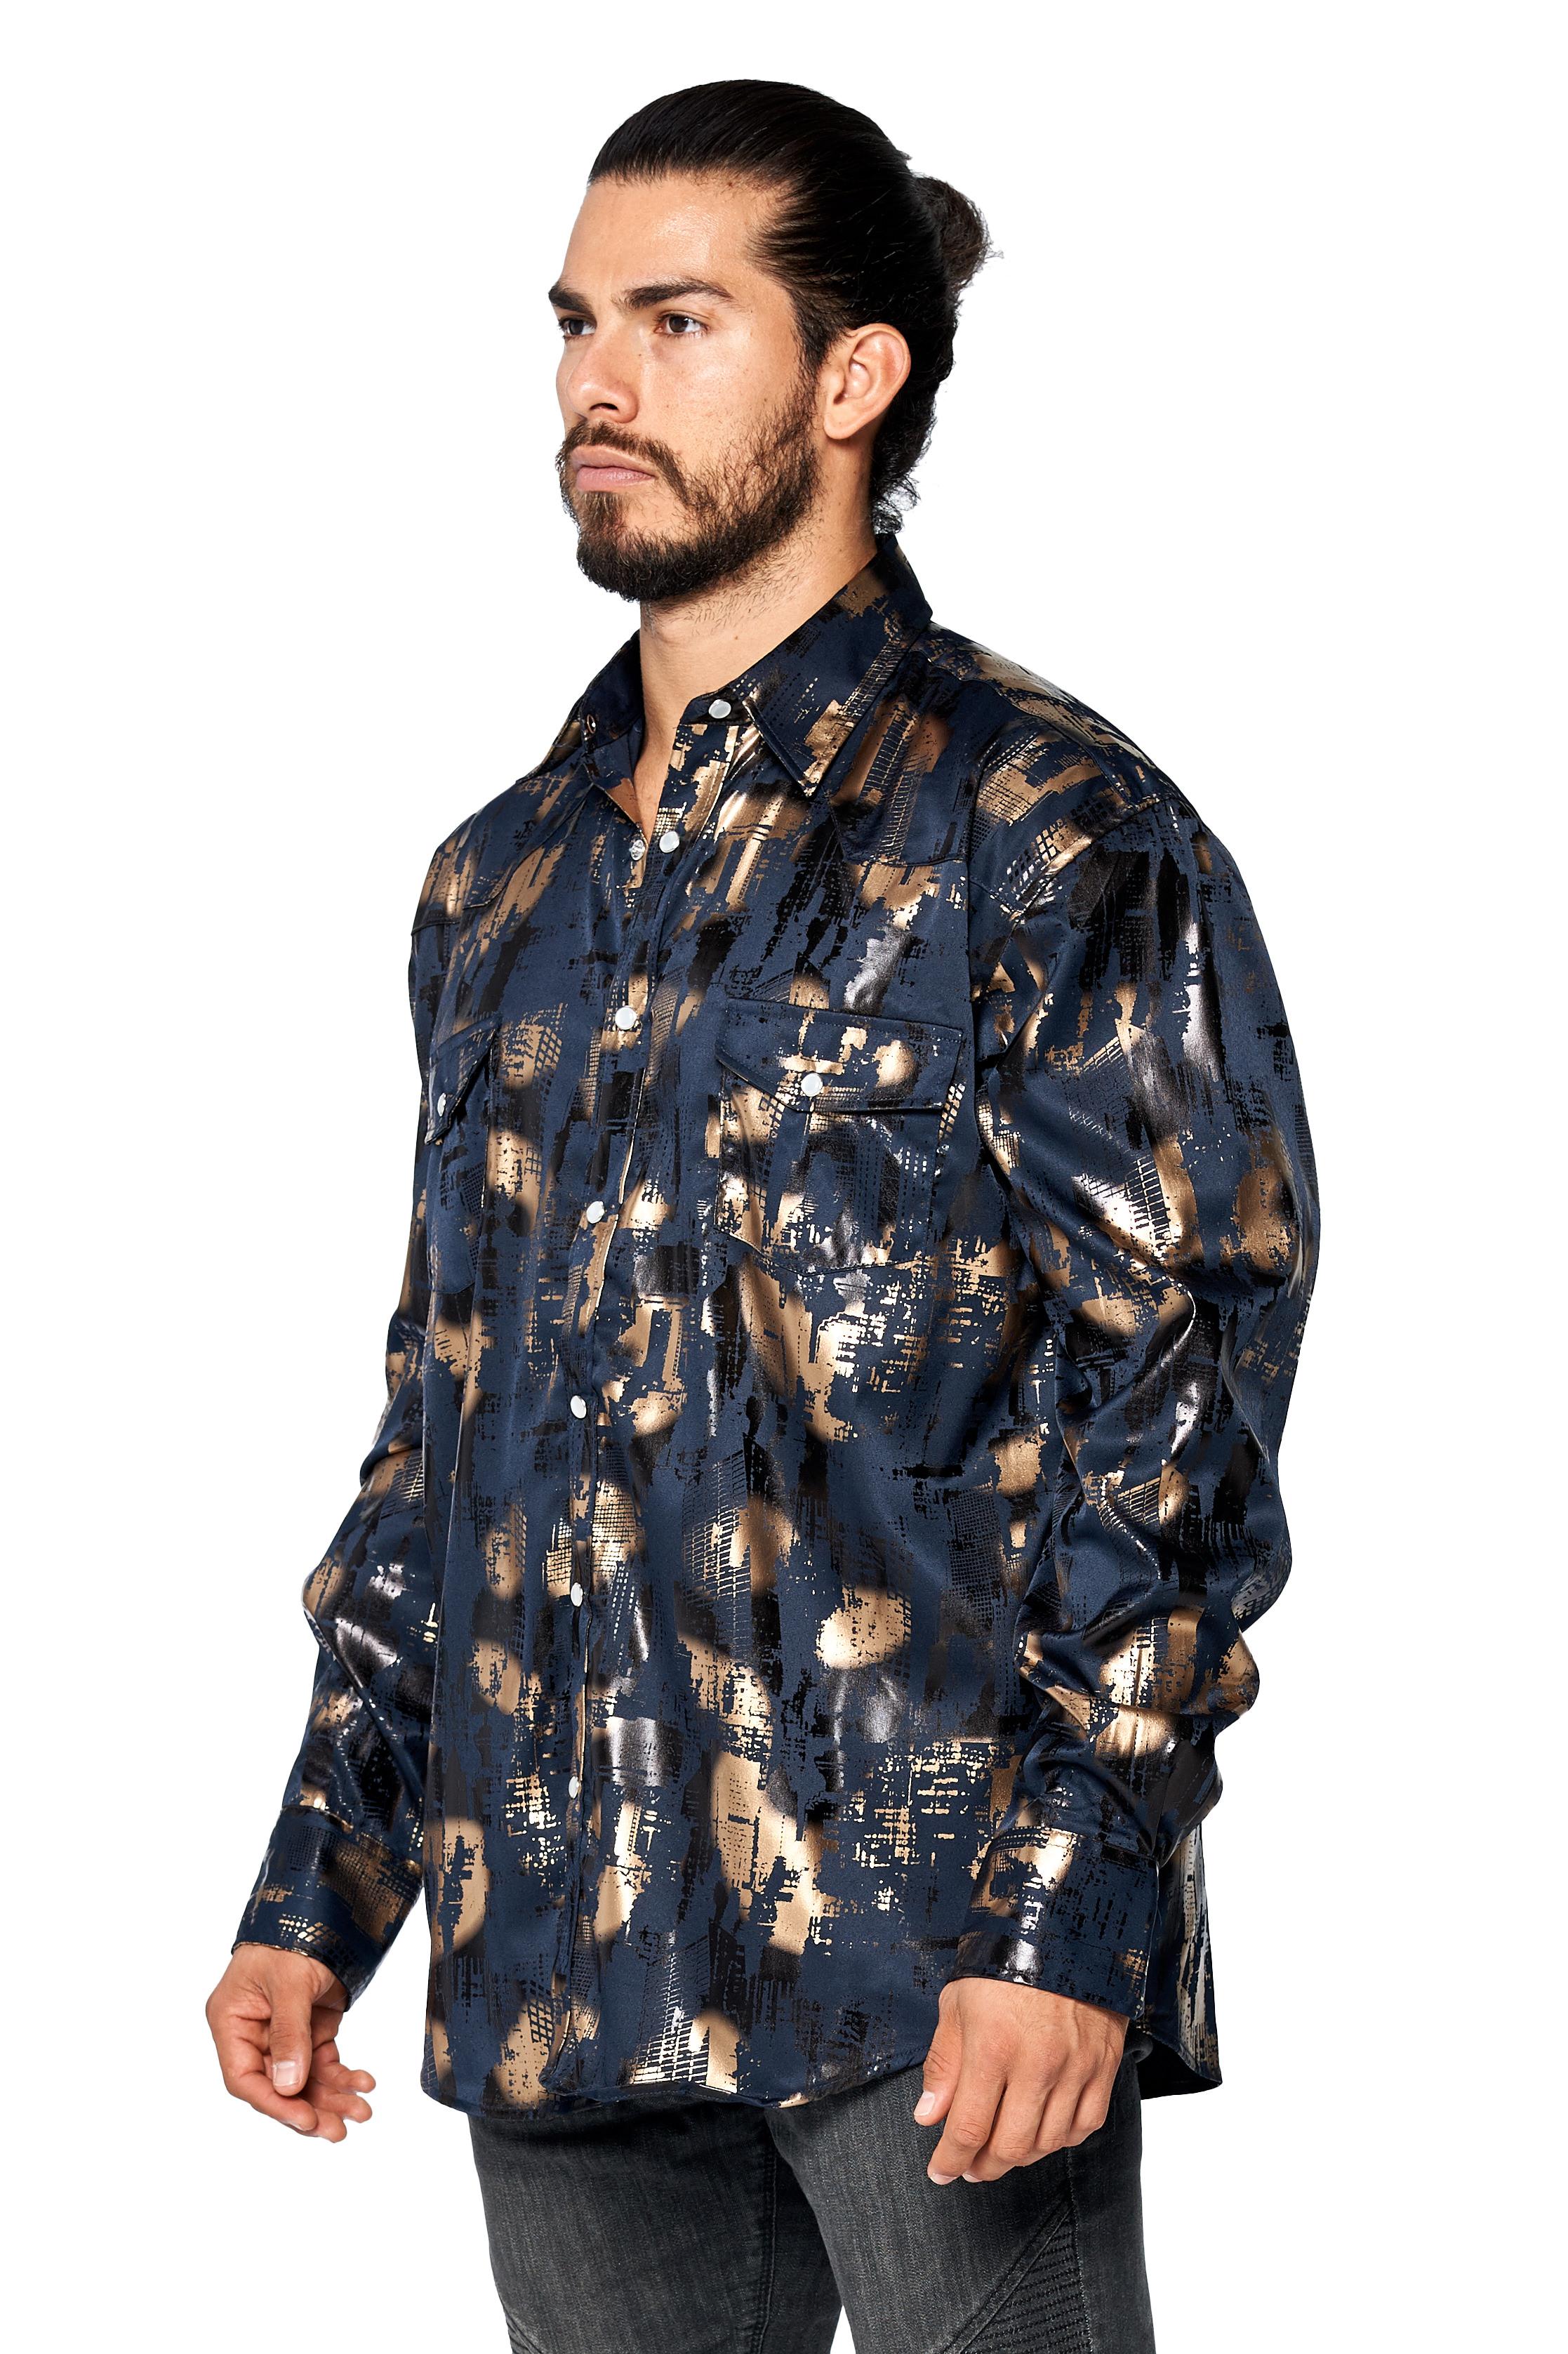 LW-Men-039-s-Pearl-Snap-Tribal-Stylish-Printed-Woven-Western-Vaquero-Rodeo-Shirt thumbnail 27